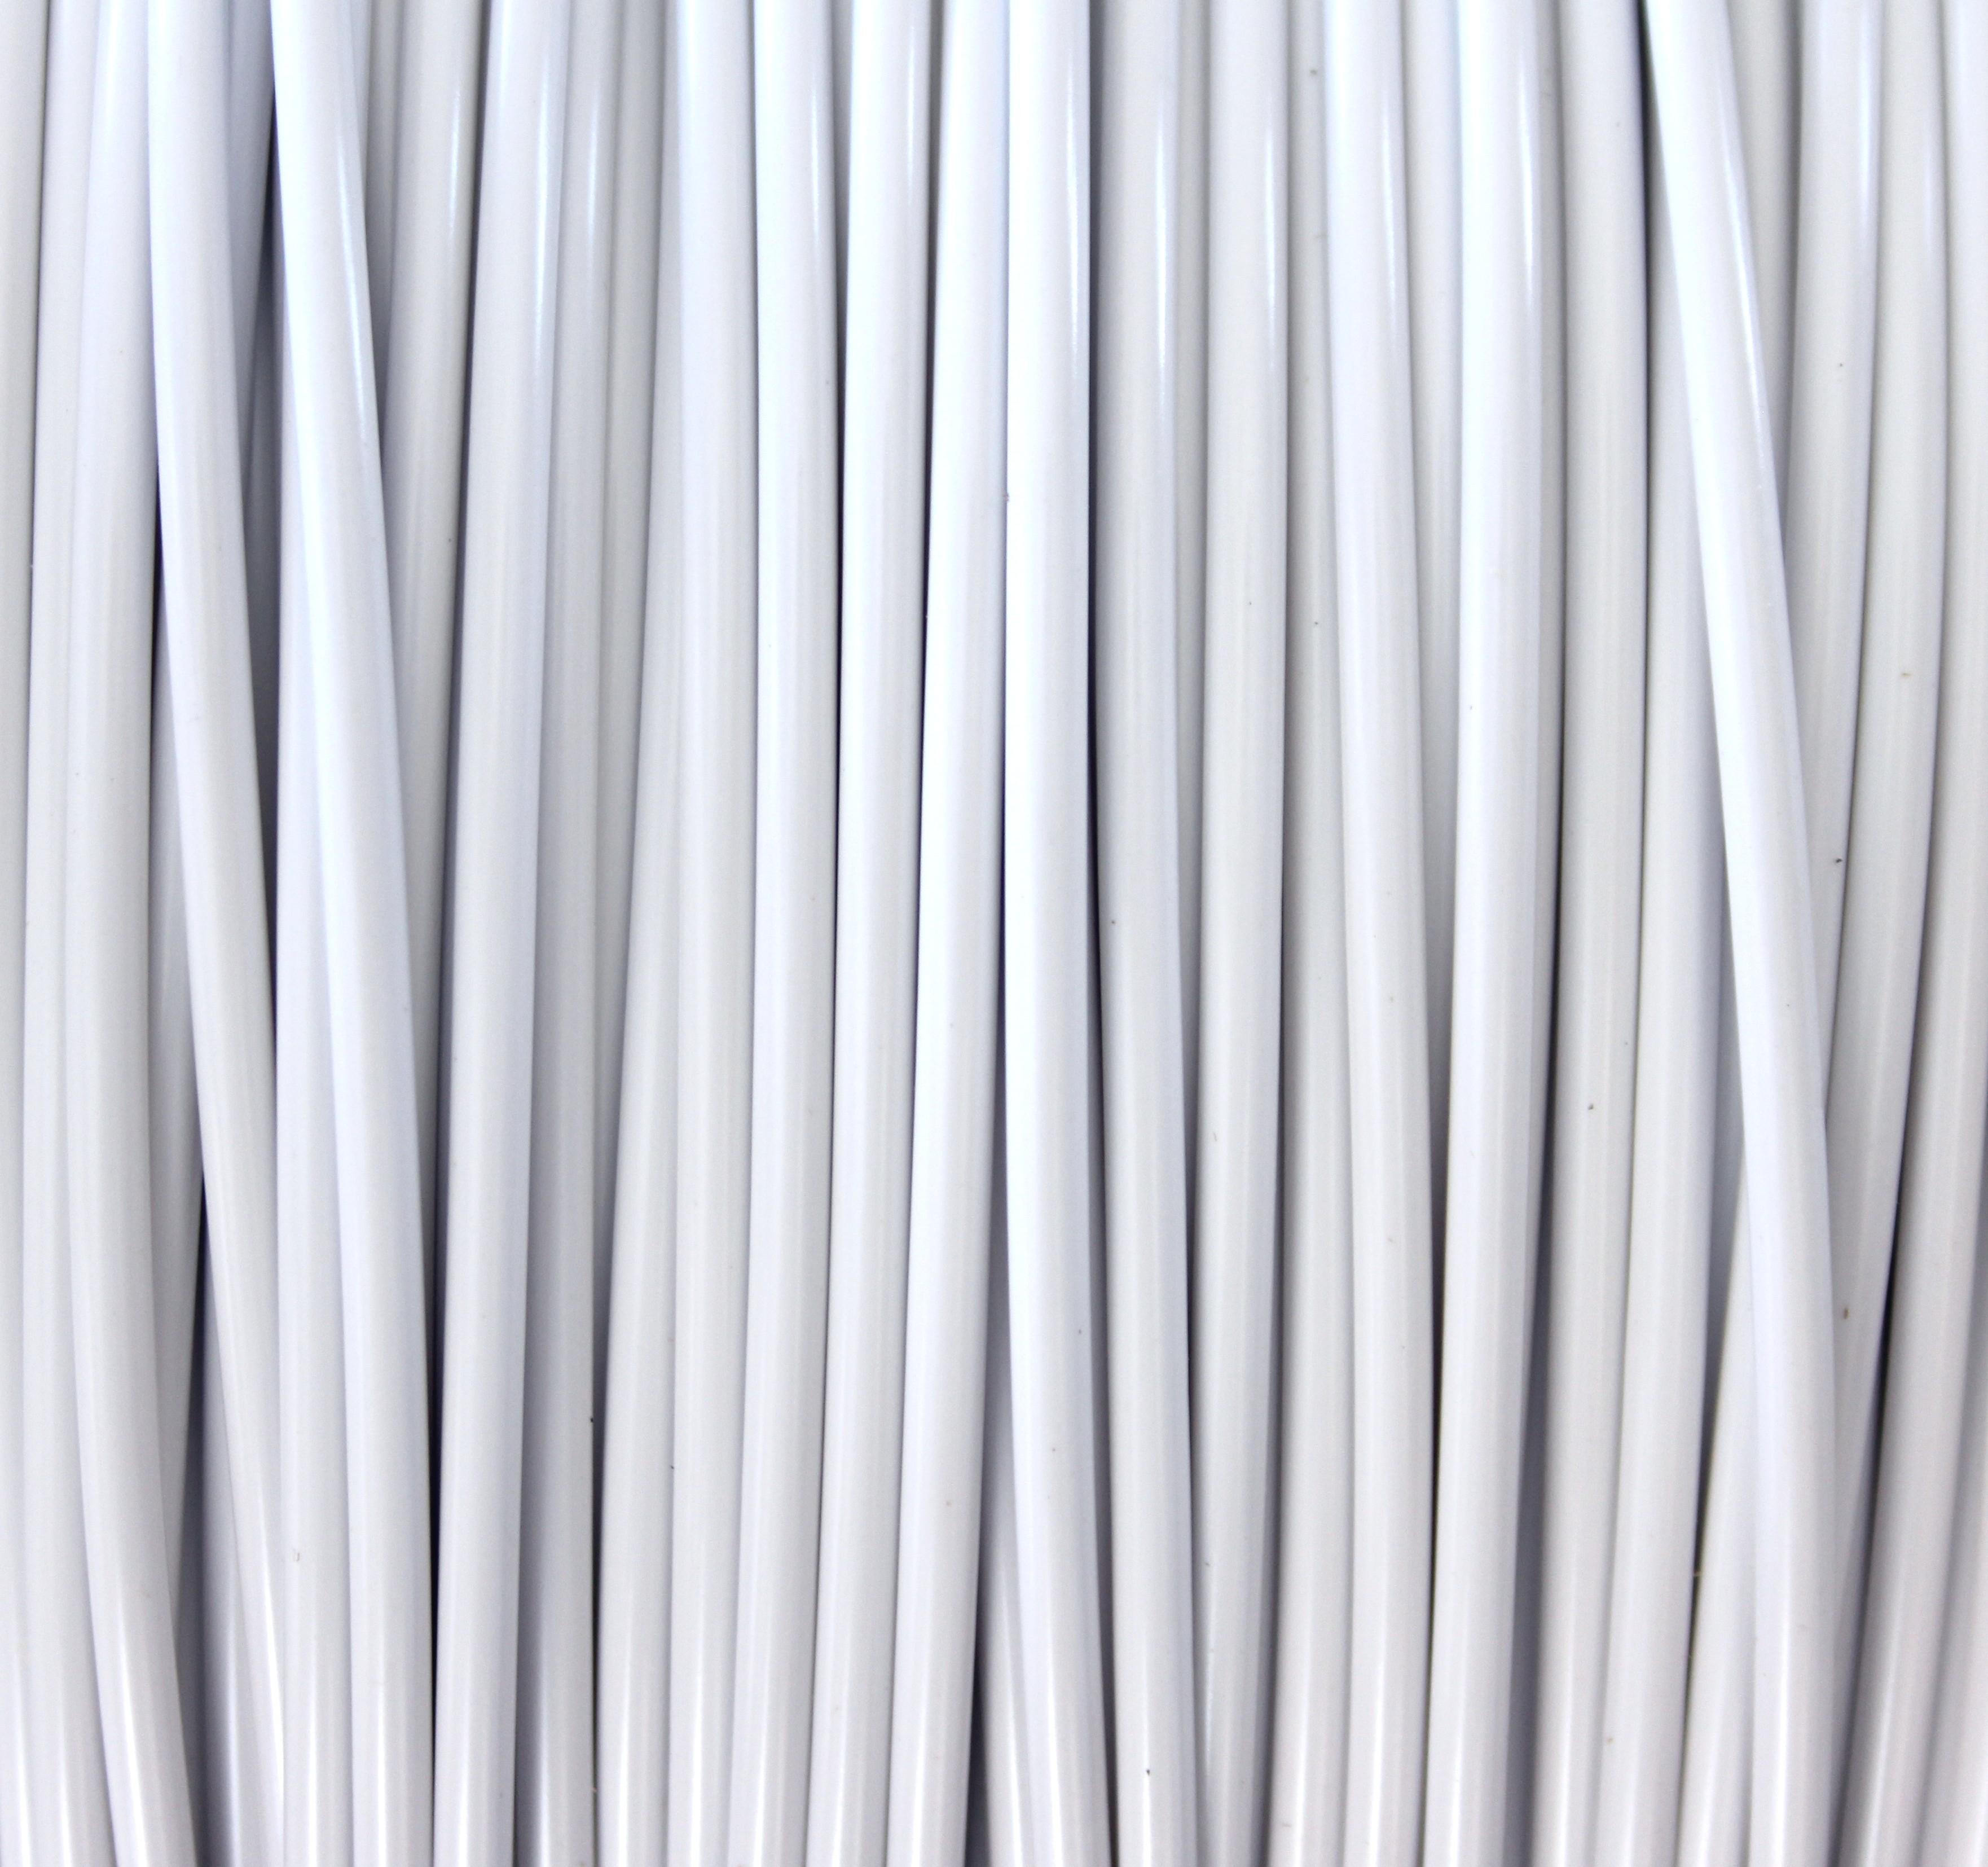 ABS+ - White - spool 1kg - 3mm